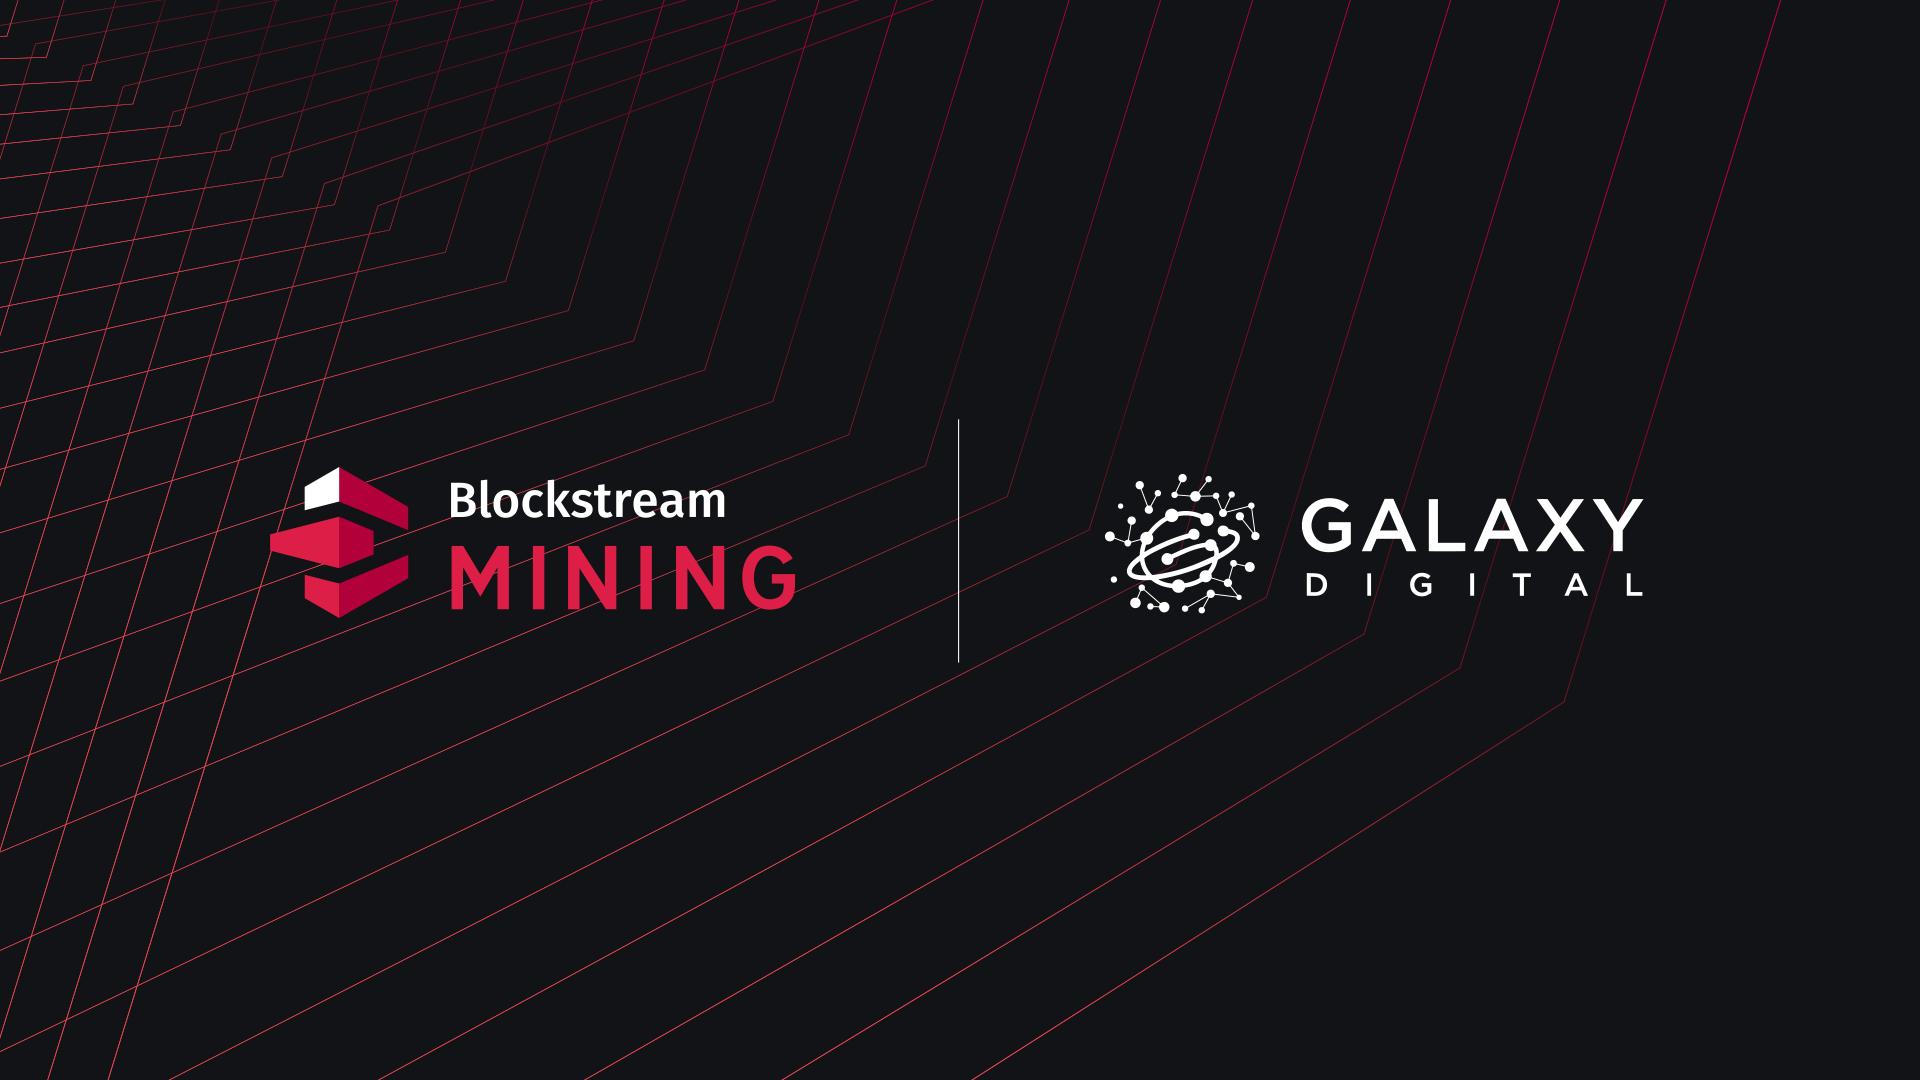 Galaxy Digital Now Mining Bitcoin with Blockstream